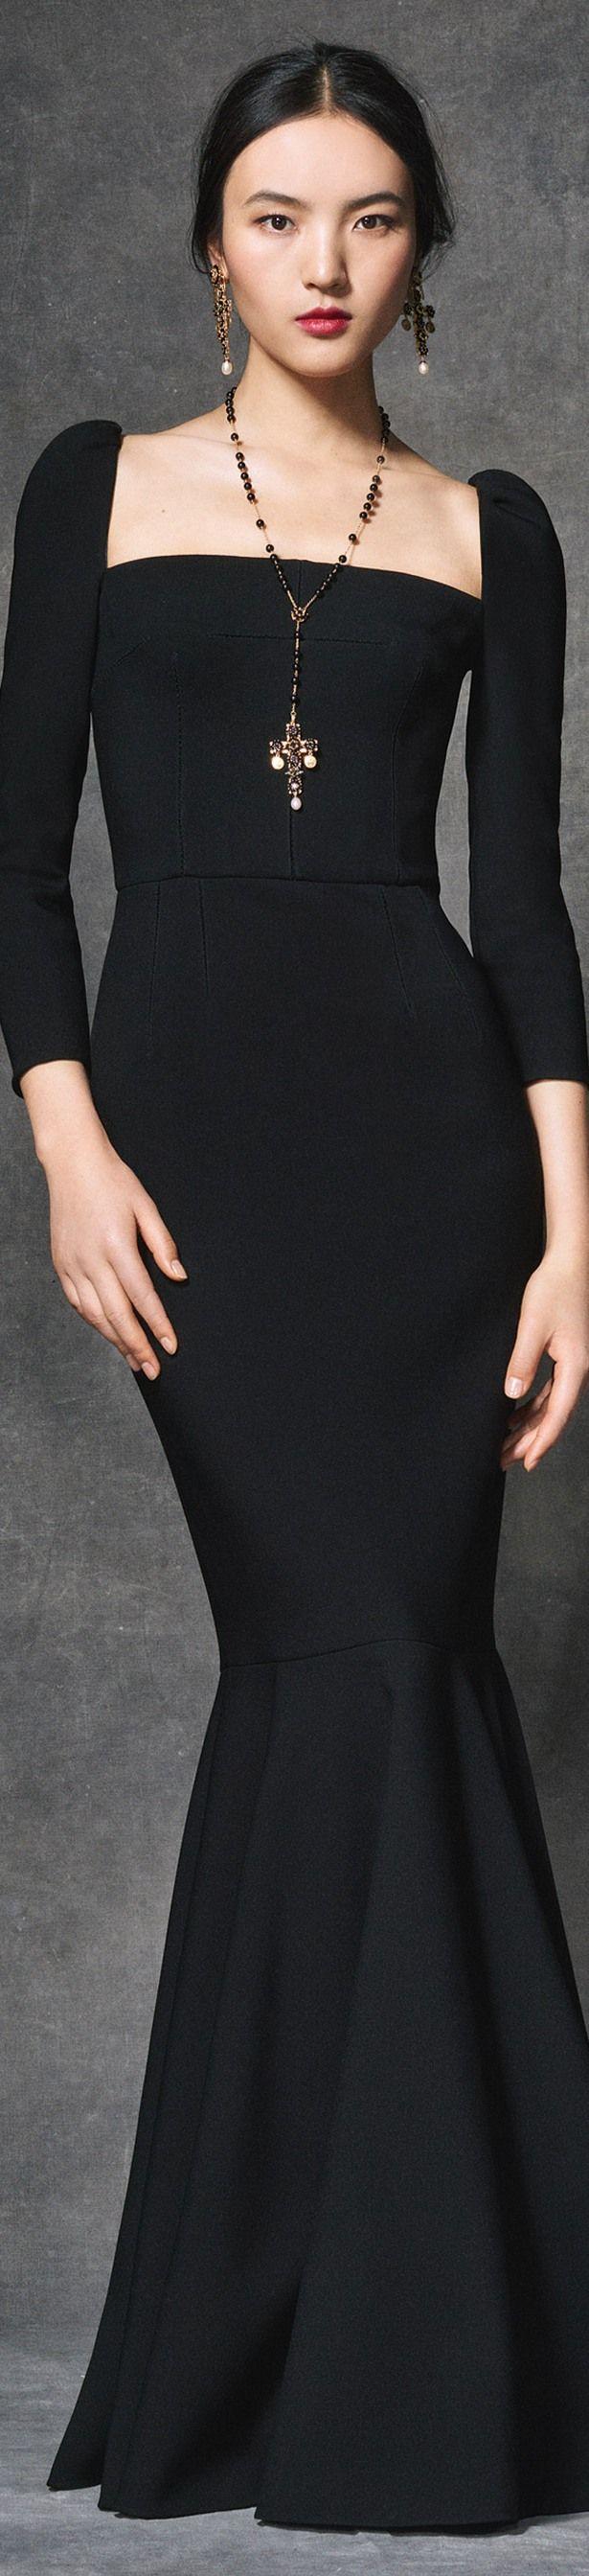 Dolce and Gabbana Winter 2017